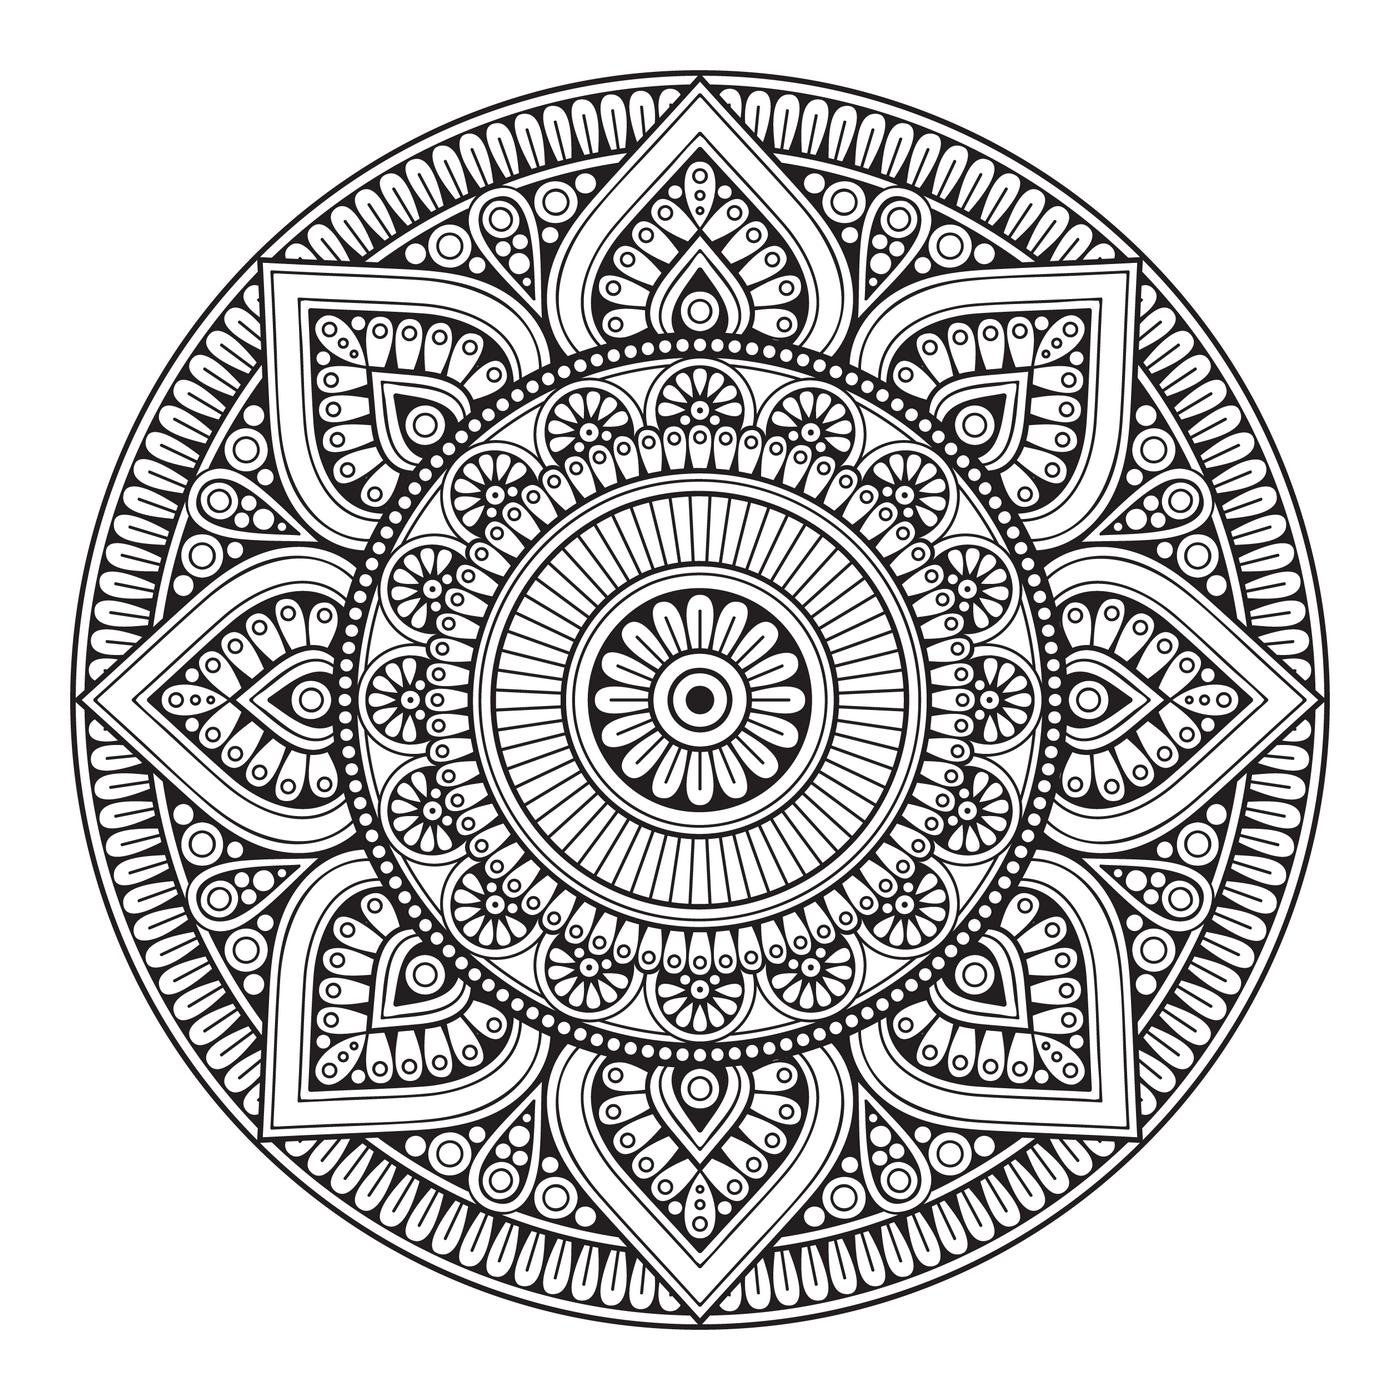 Einzigartig Mamdala Farbung Malvorlagen Malvorlagenfurkinder Mandala Ausmalen Mehndi Muster Mandala Muster